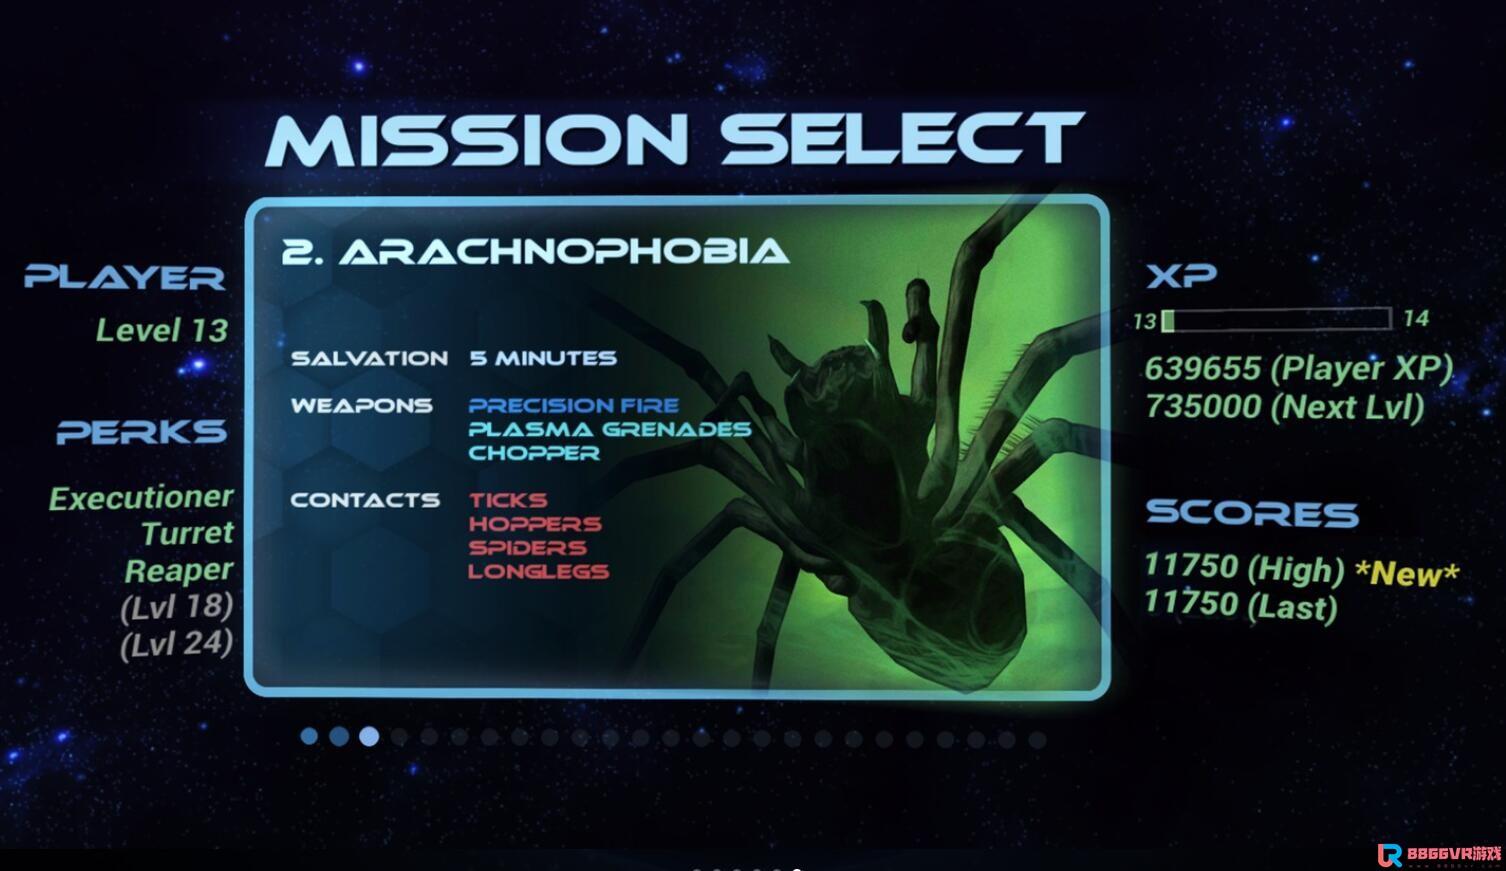 [Oculus quest] 崩溃之地 VR(Crashland VR)